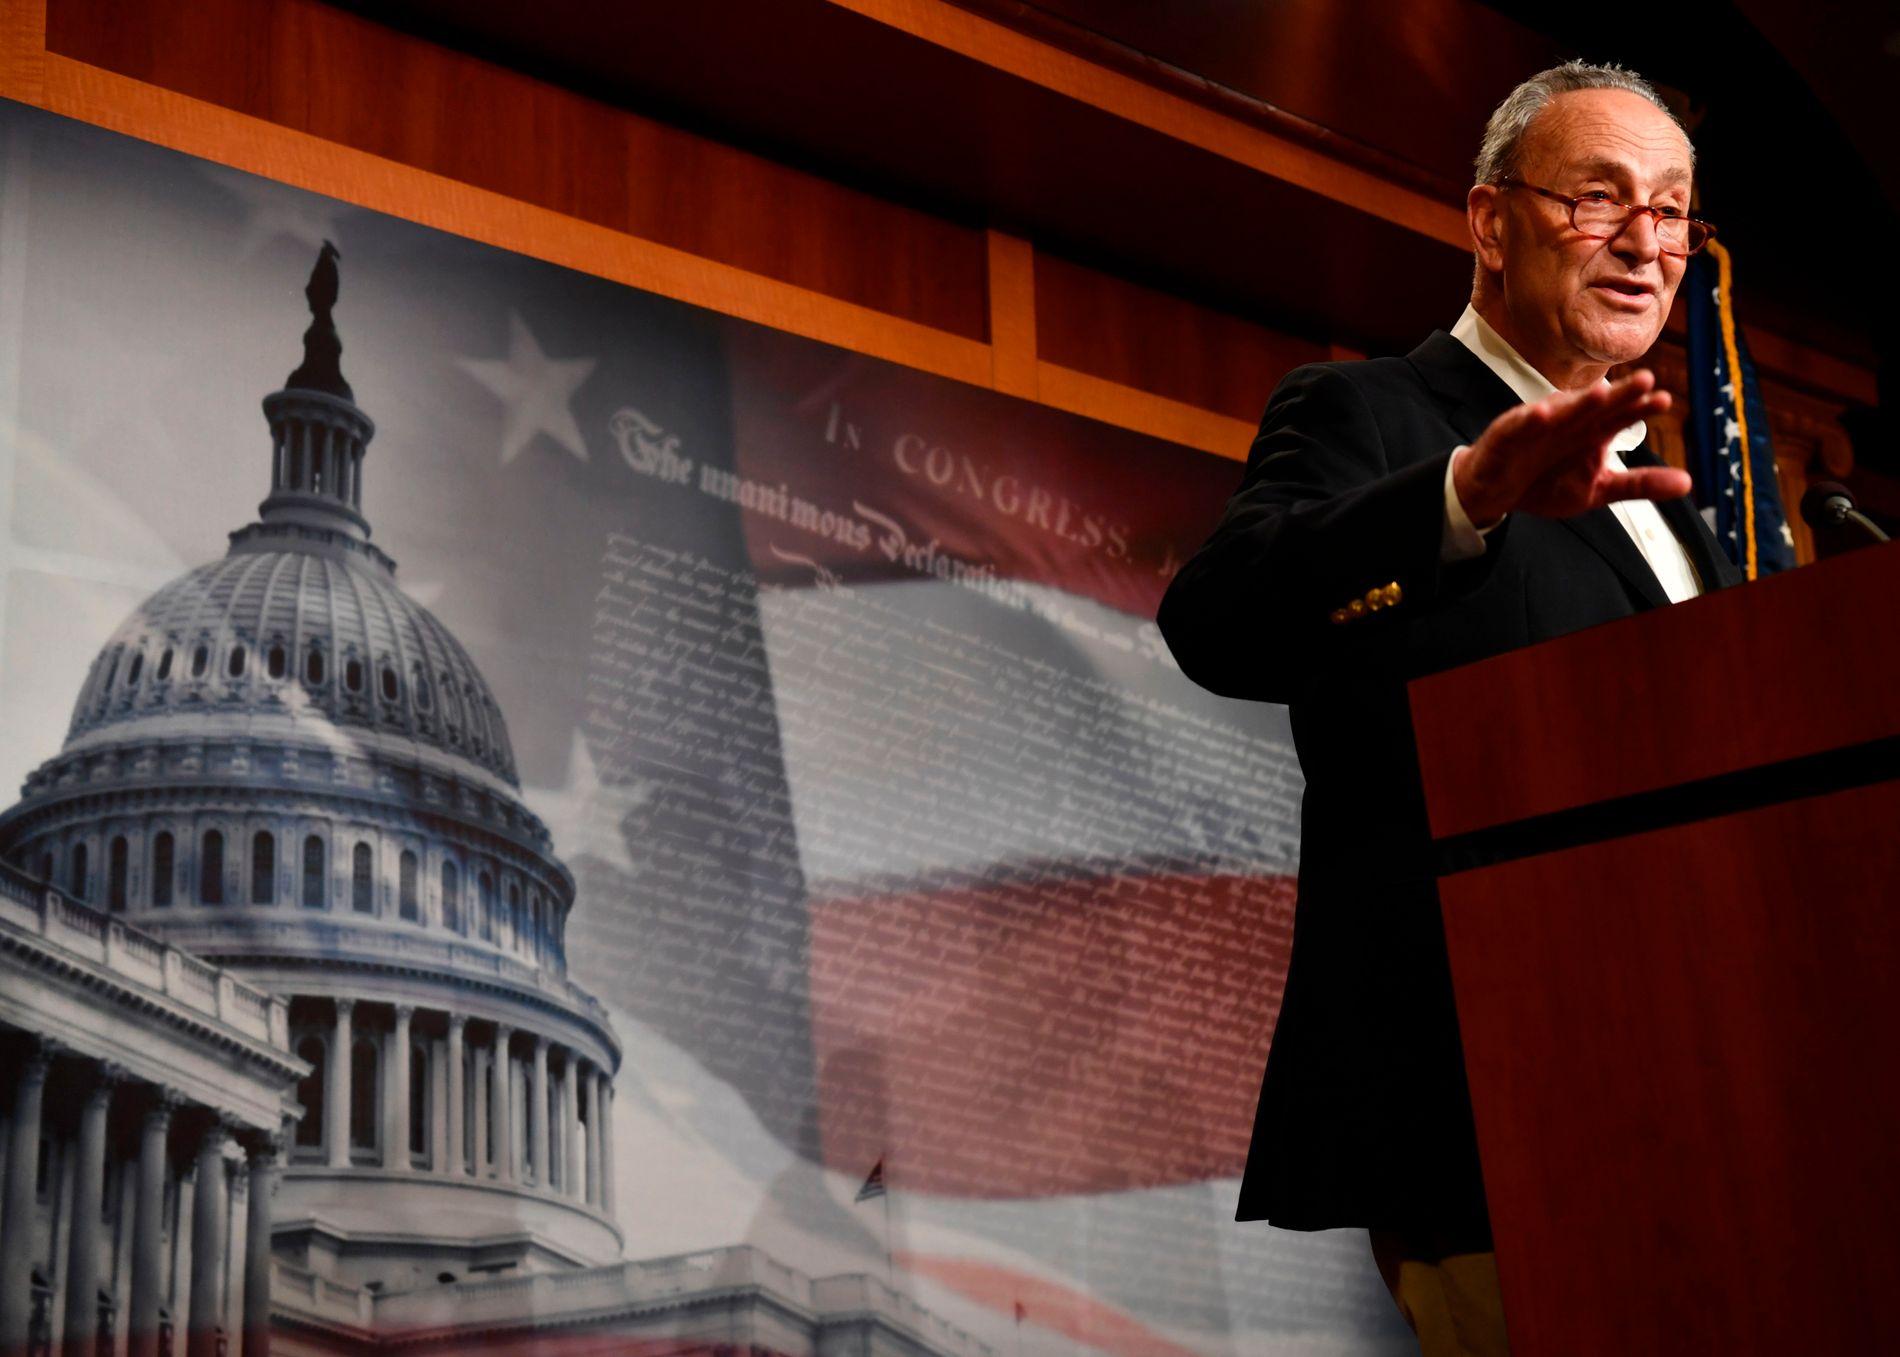 CHUCK SCHUMER: Demokratenes leder i Senatet skvatt da han fikk beskjed om sparkingen av Sessions på en lapp under sin egen pressekonferanse.